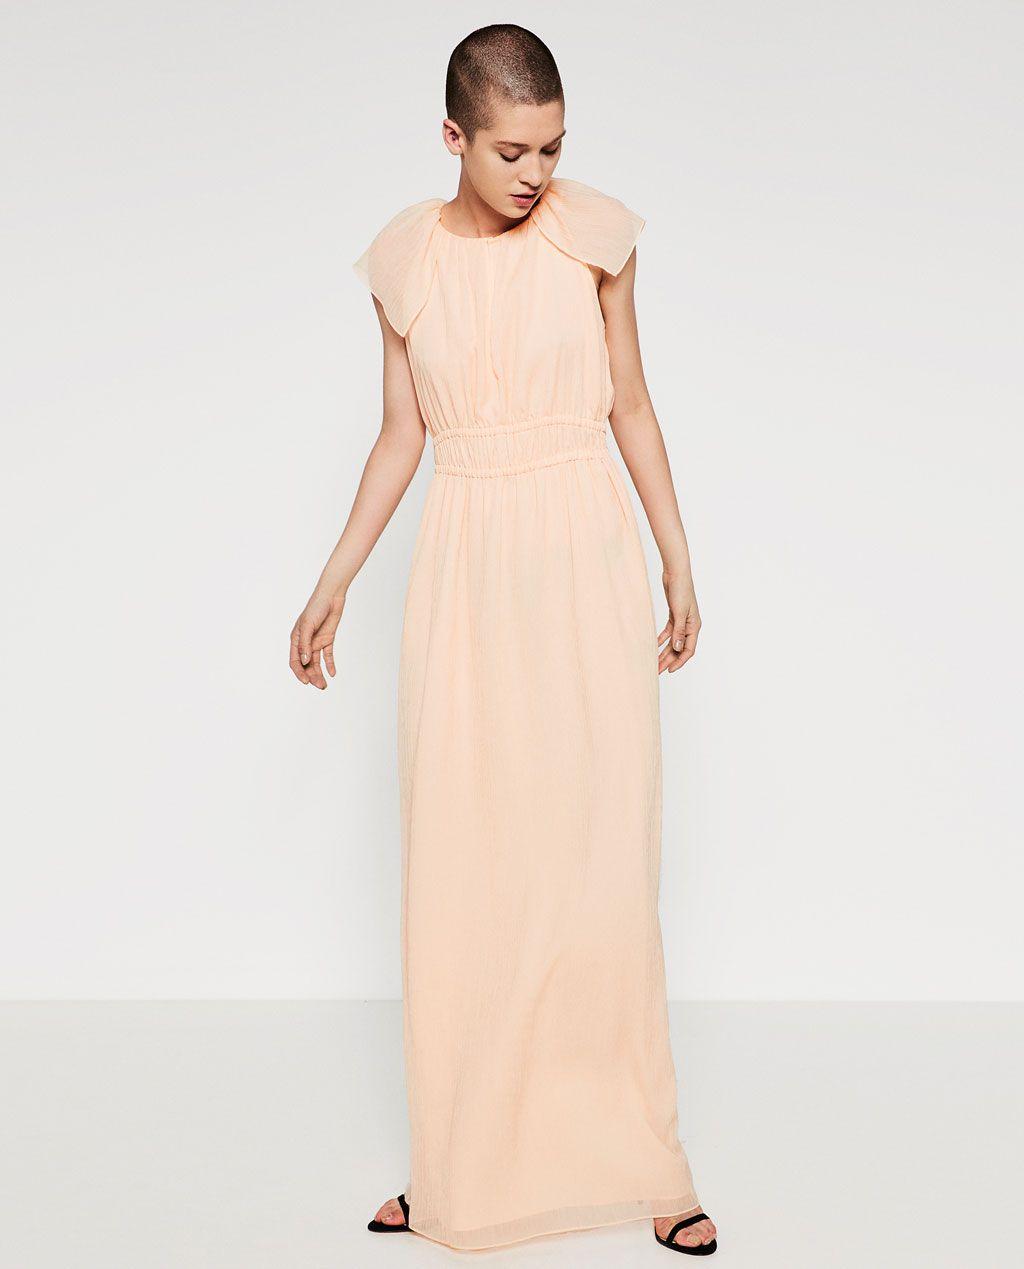 Sommerkleider damen zara